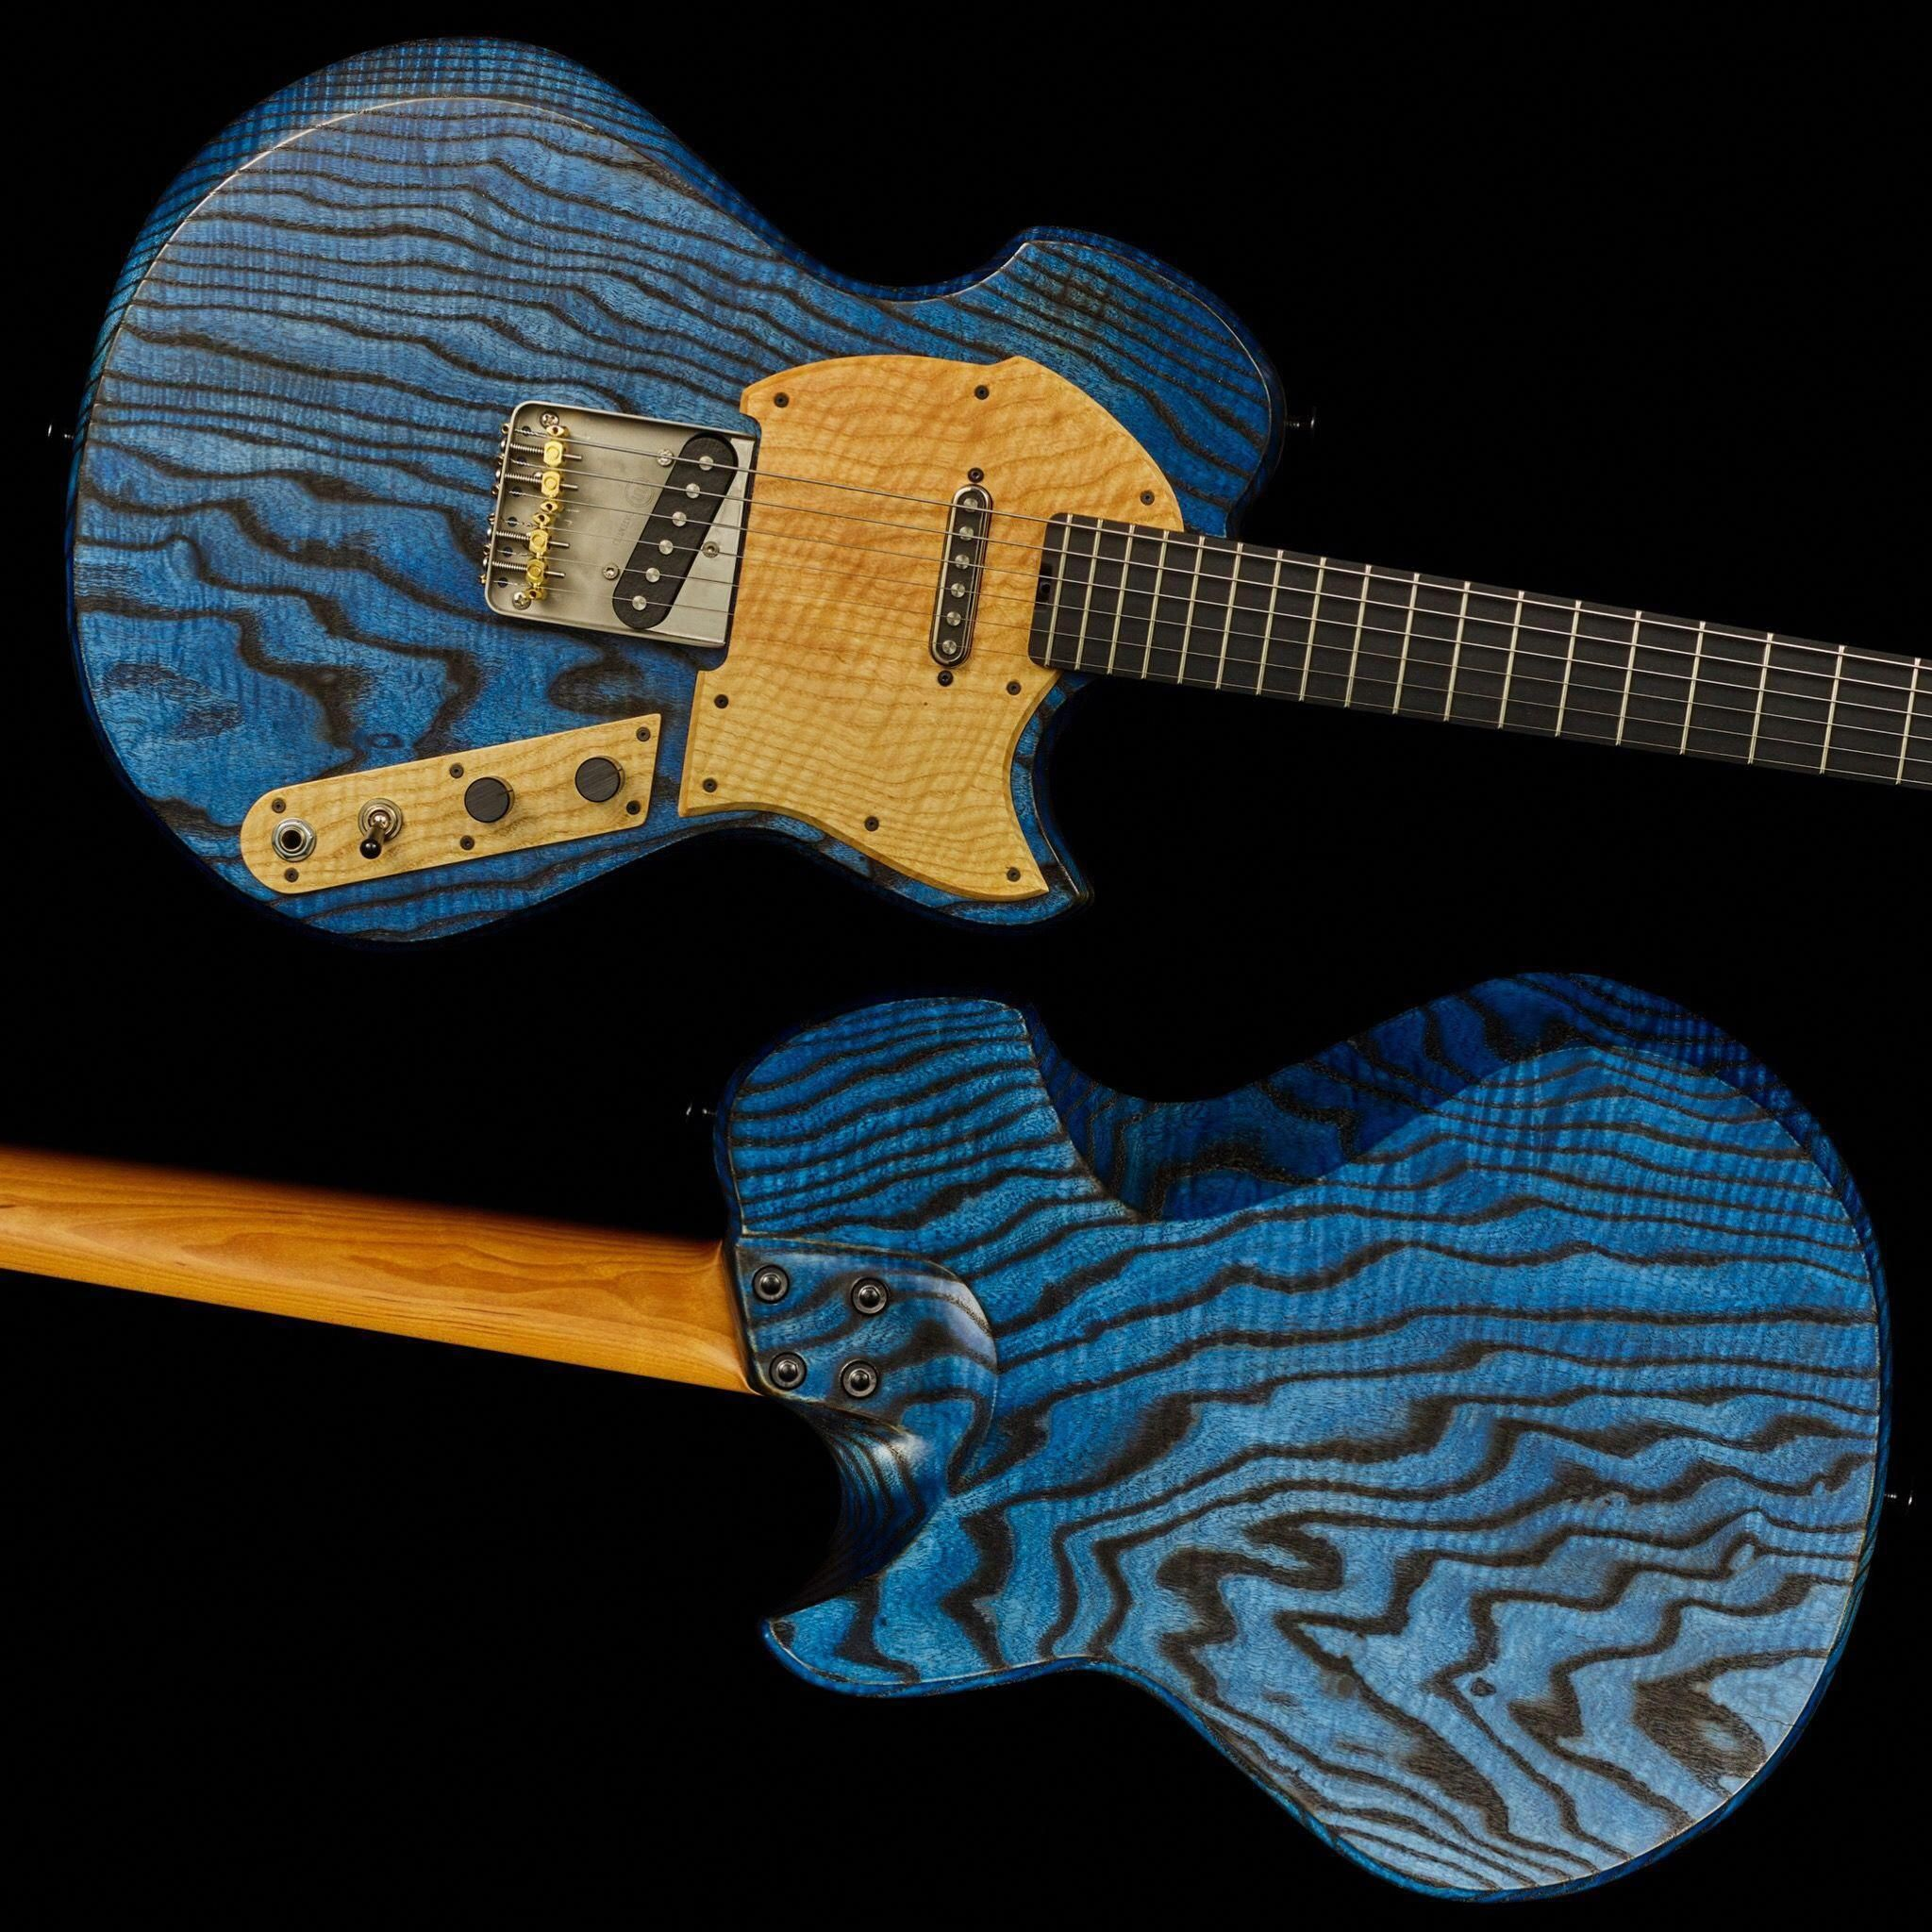 Fender Guitars Acoustic Electric Fender Guitar Kits For Beginners #guitarra #guitarsolo #FenderGuitars #fenderguitars